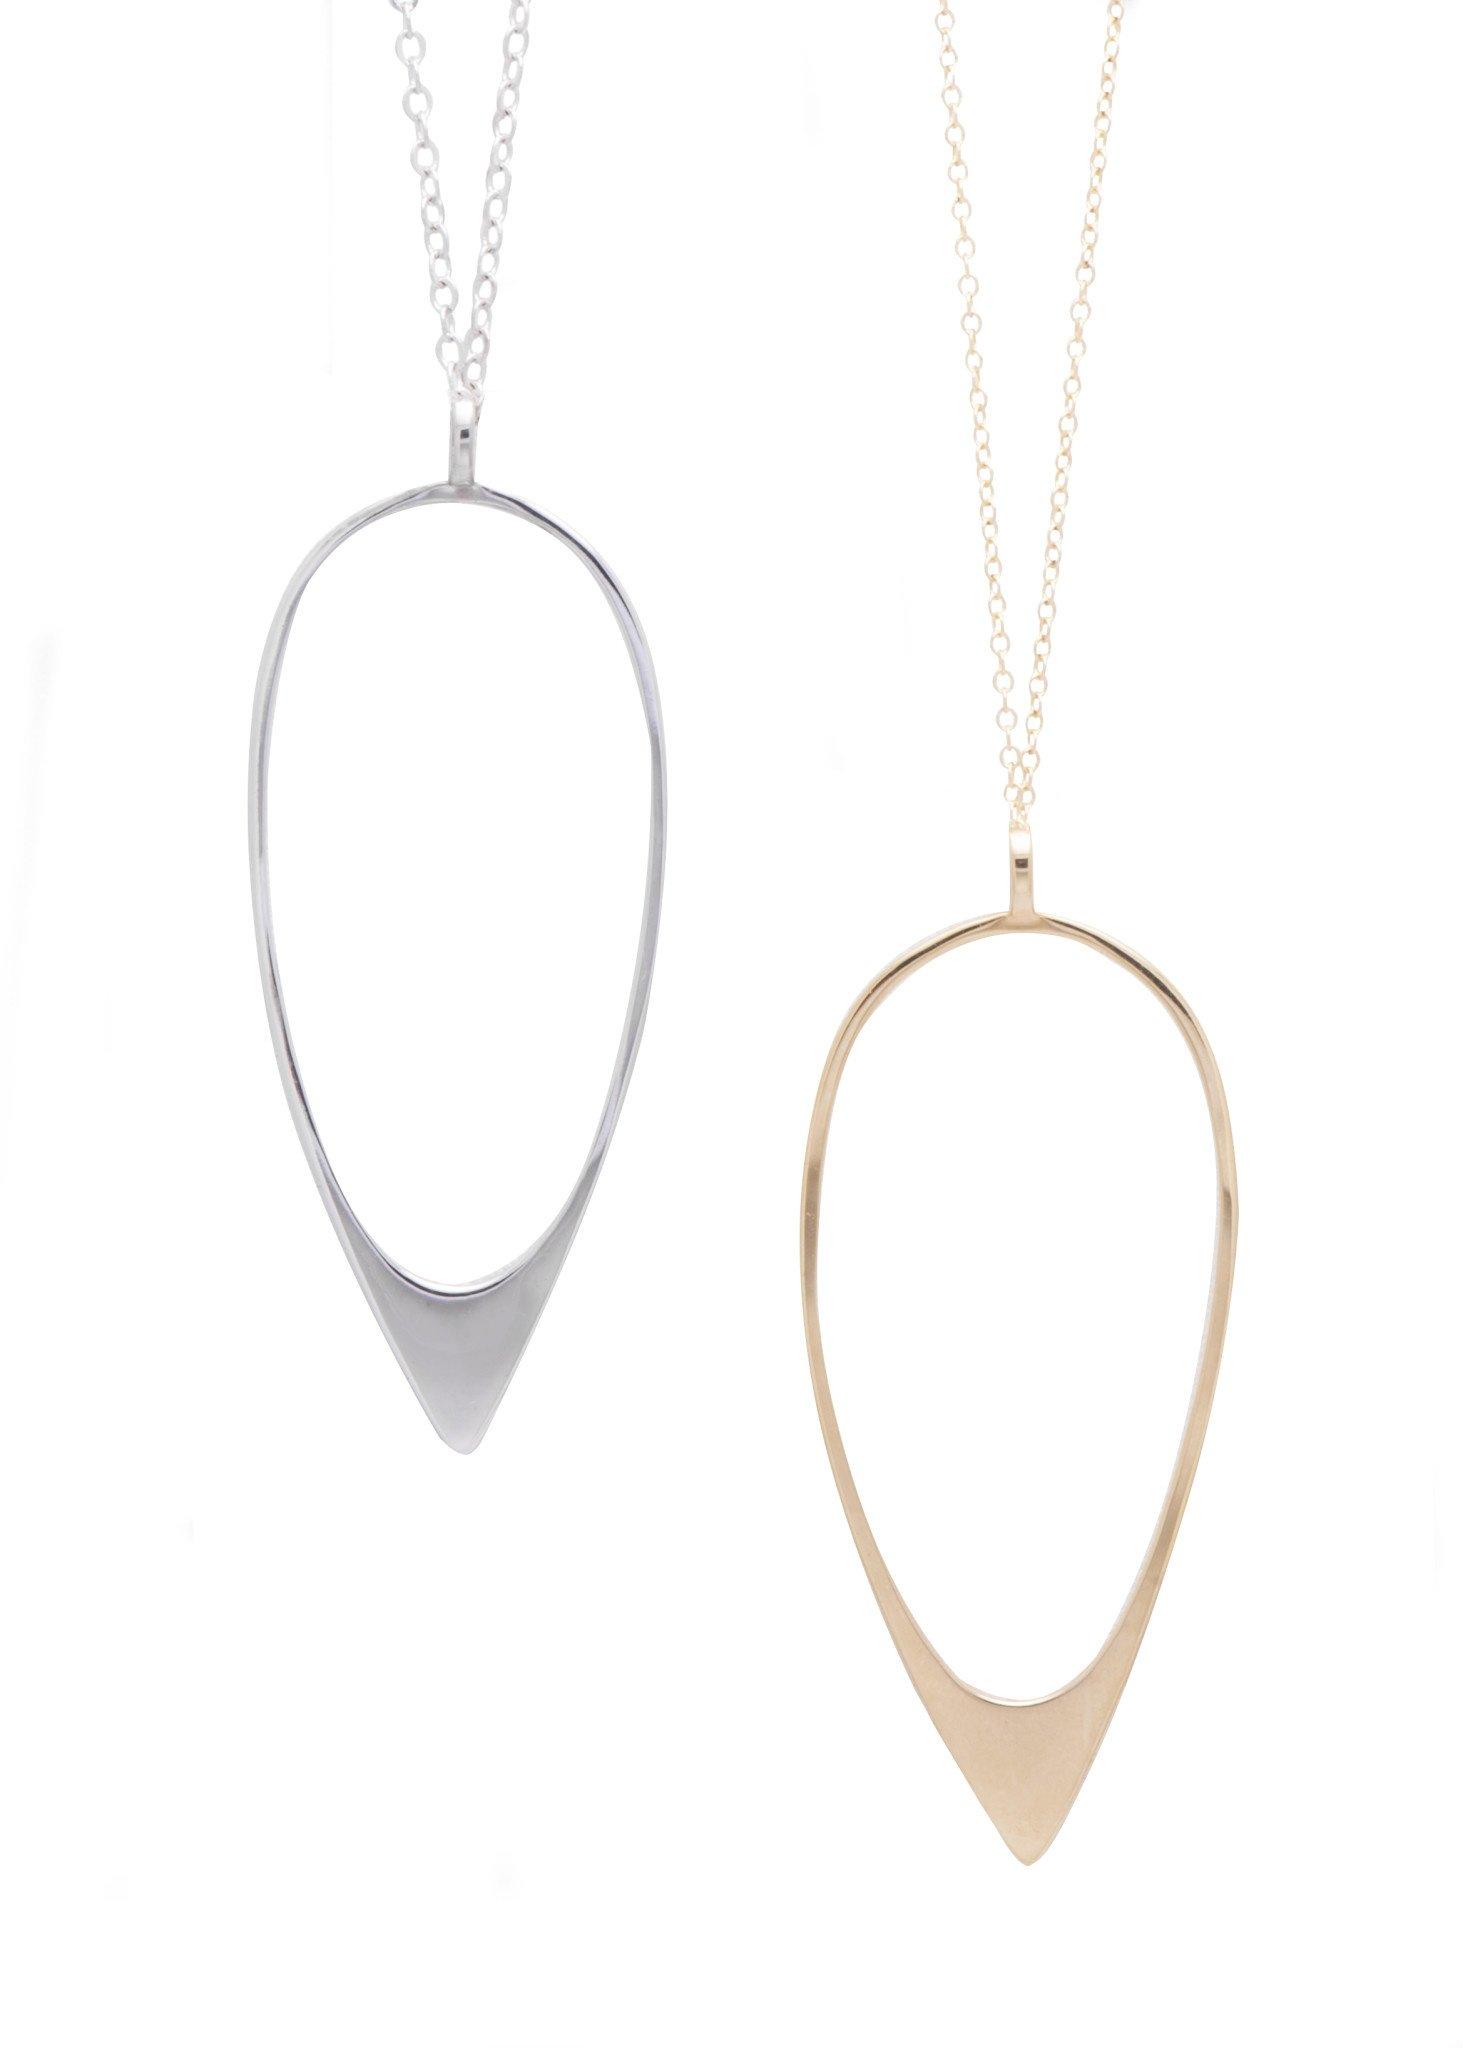 Sarah Mulder Jewelry Collier Ariam Large